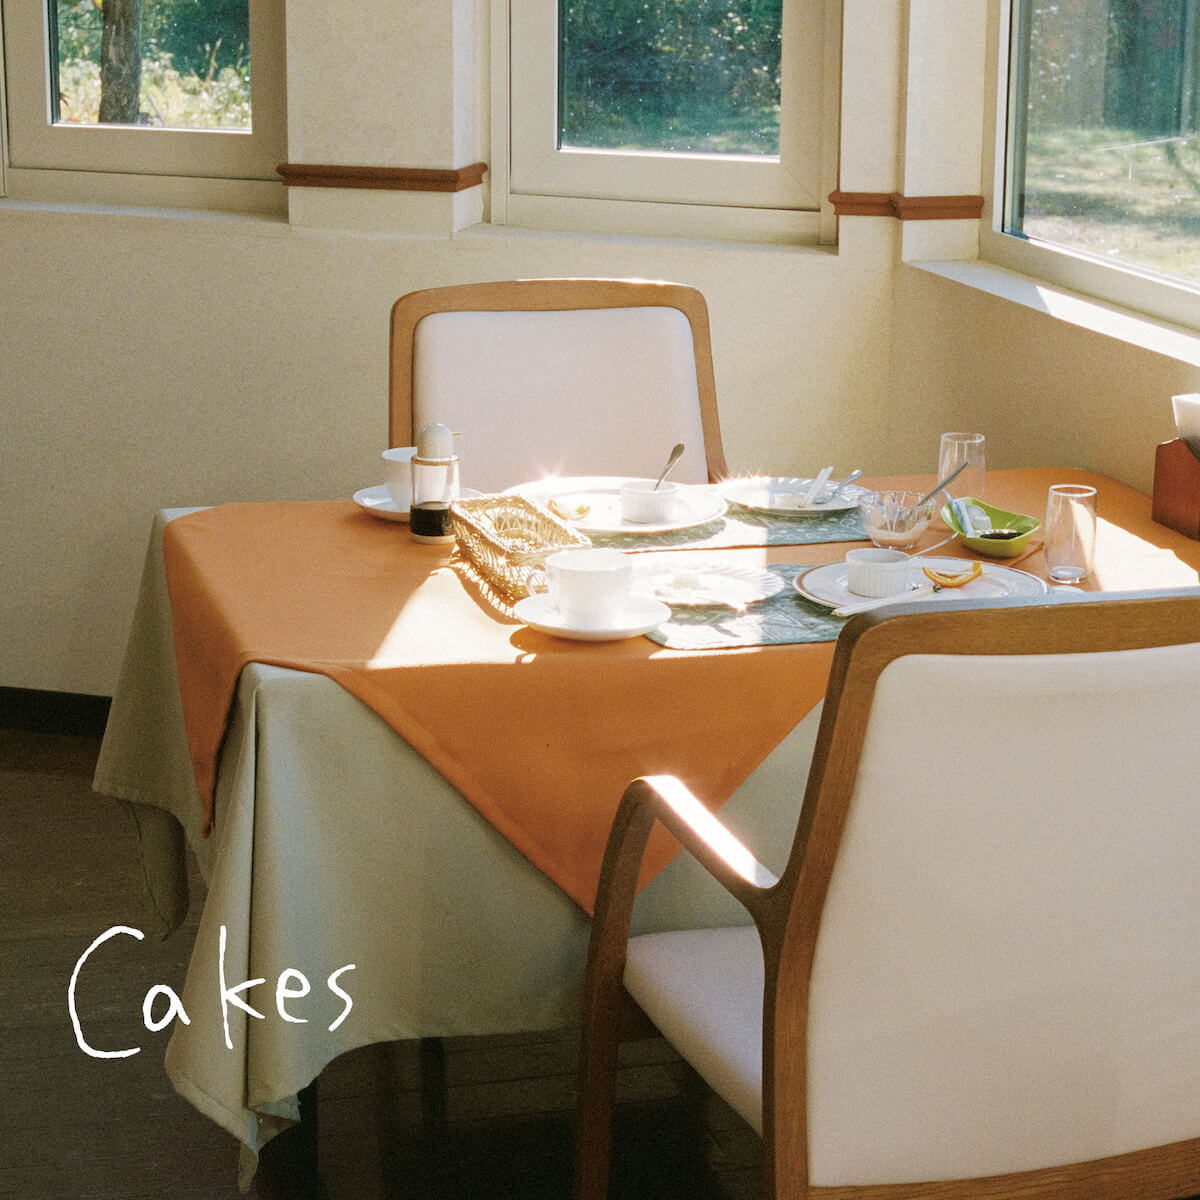 Homecomings、映画『愛がなんだ』の主題歌「Cakes」のMV公開|タワレコ新宿、京都にてインストアイベント開催も music190510-homecomings_info